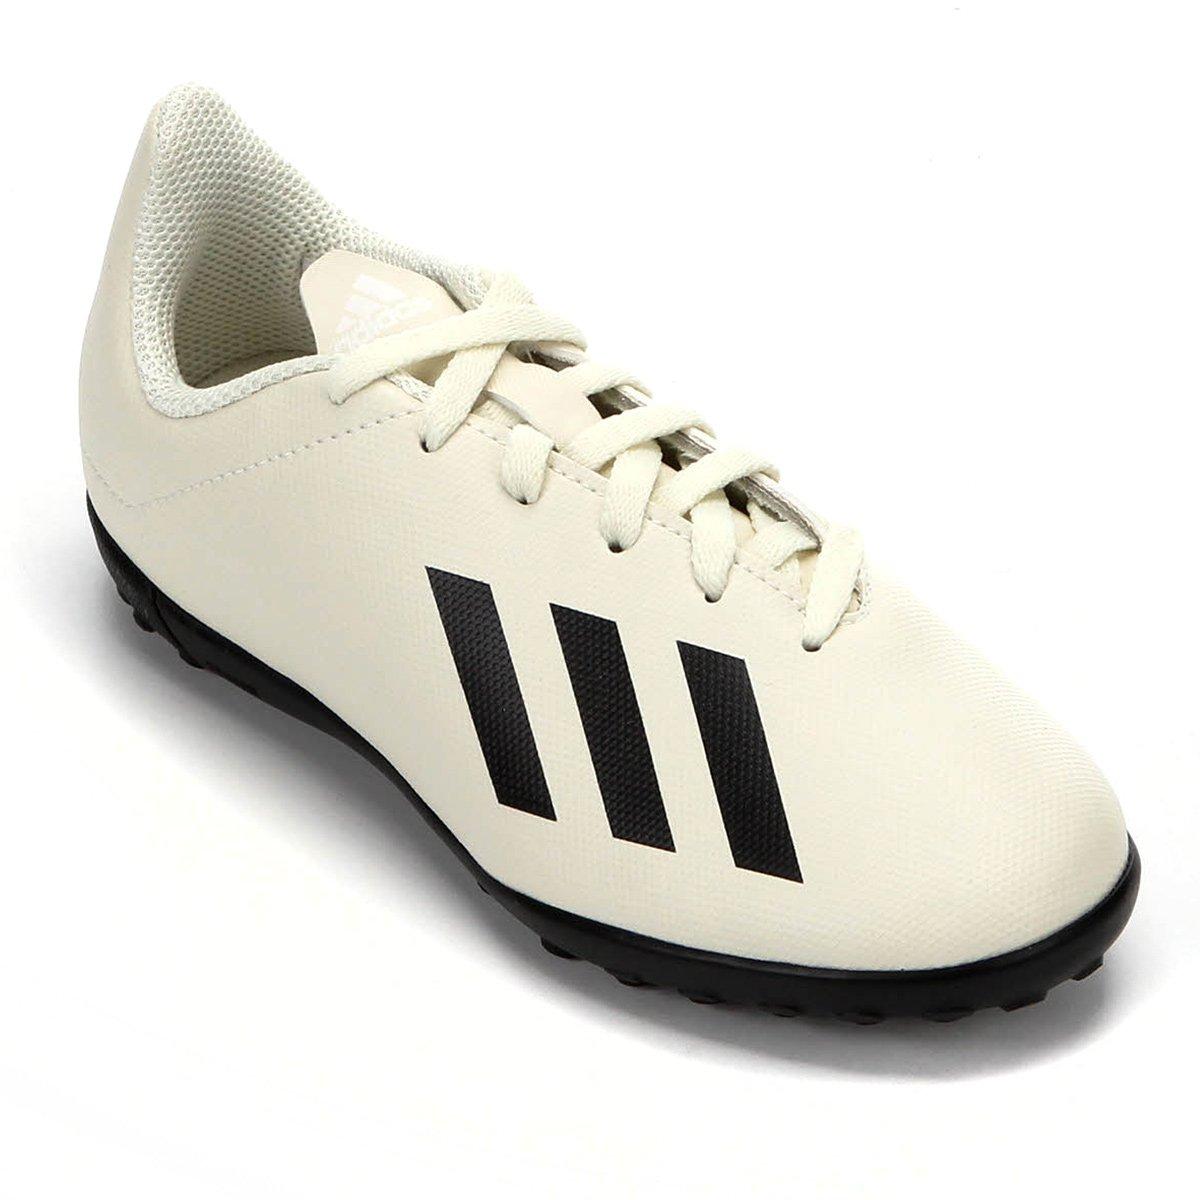 Chuteira Society Infantil Adidas X Tango 18 4 TF  5060a1dac8ca8